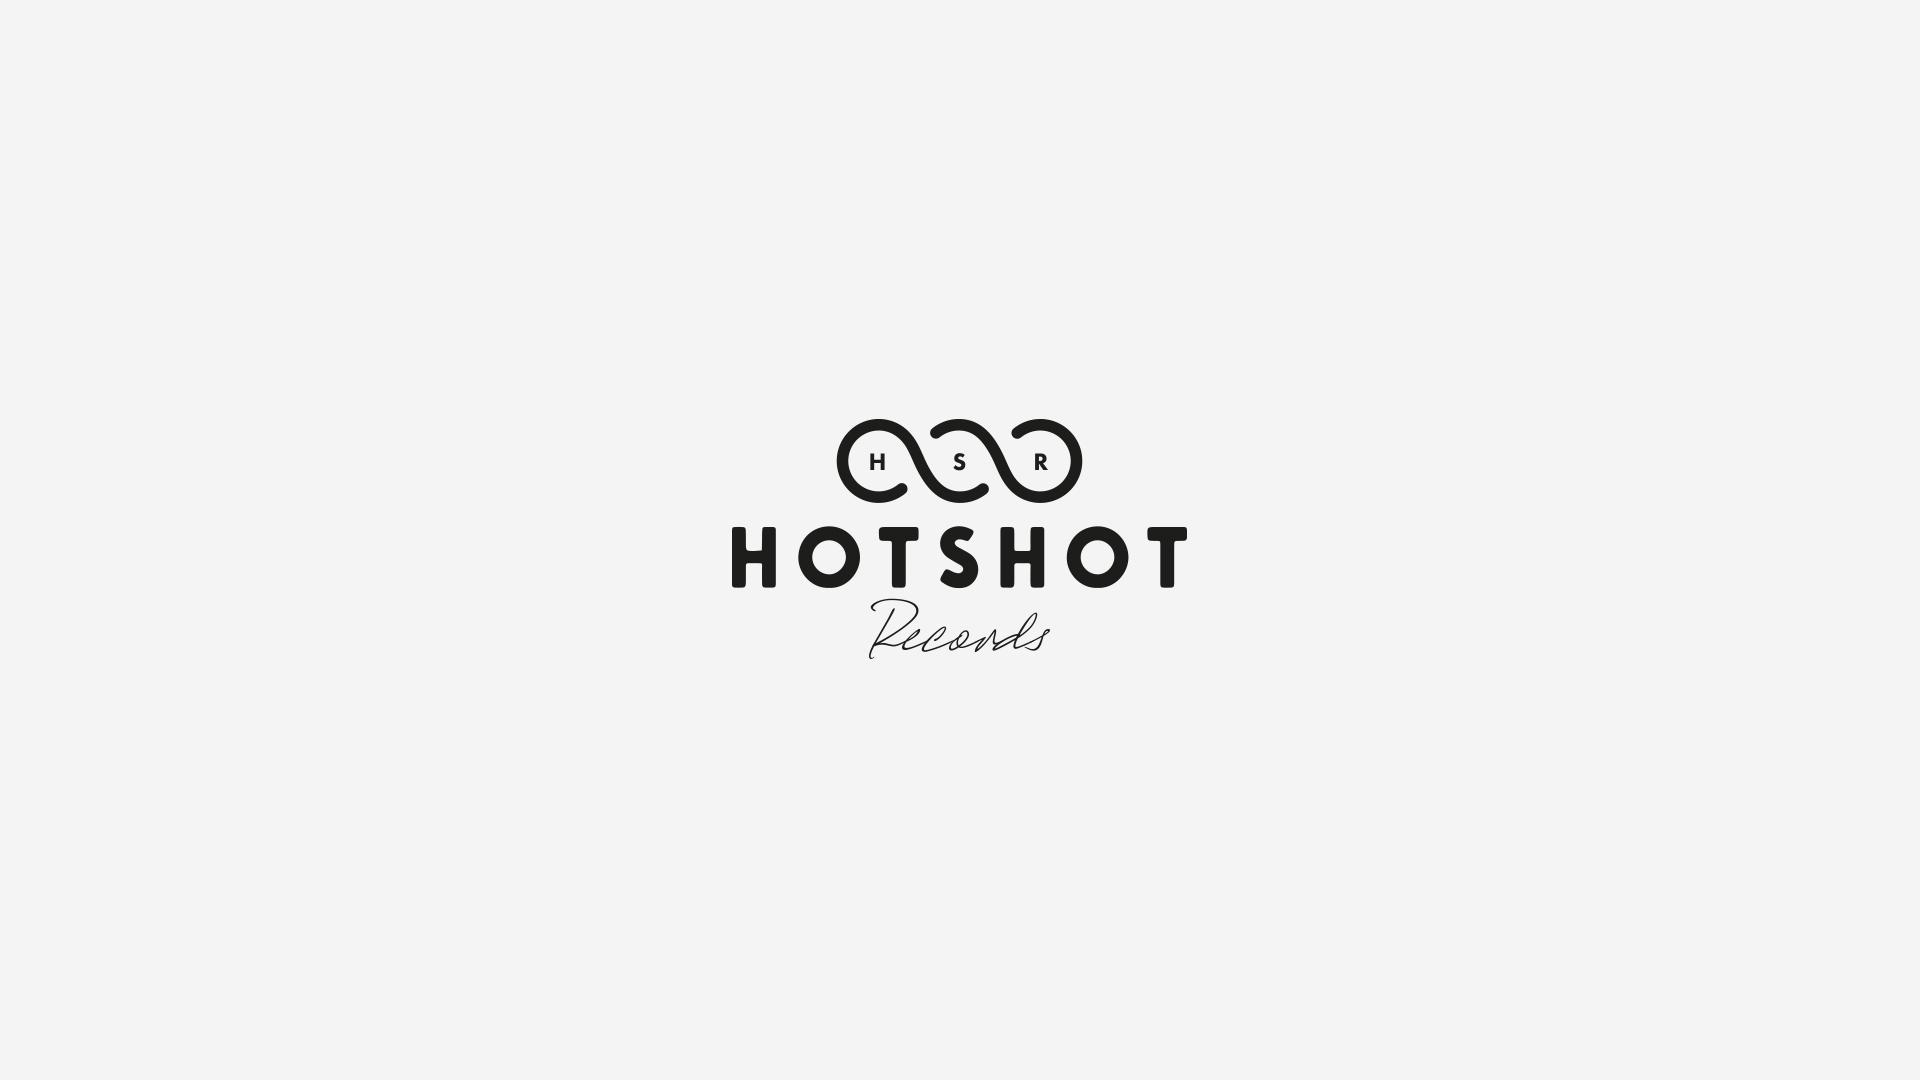 Hotshot_Records_Logo.jpg